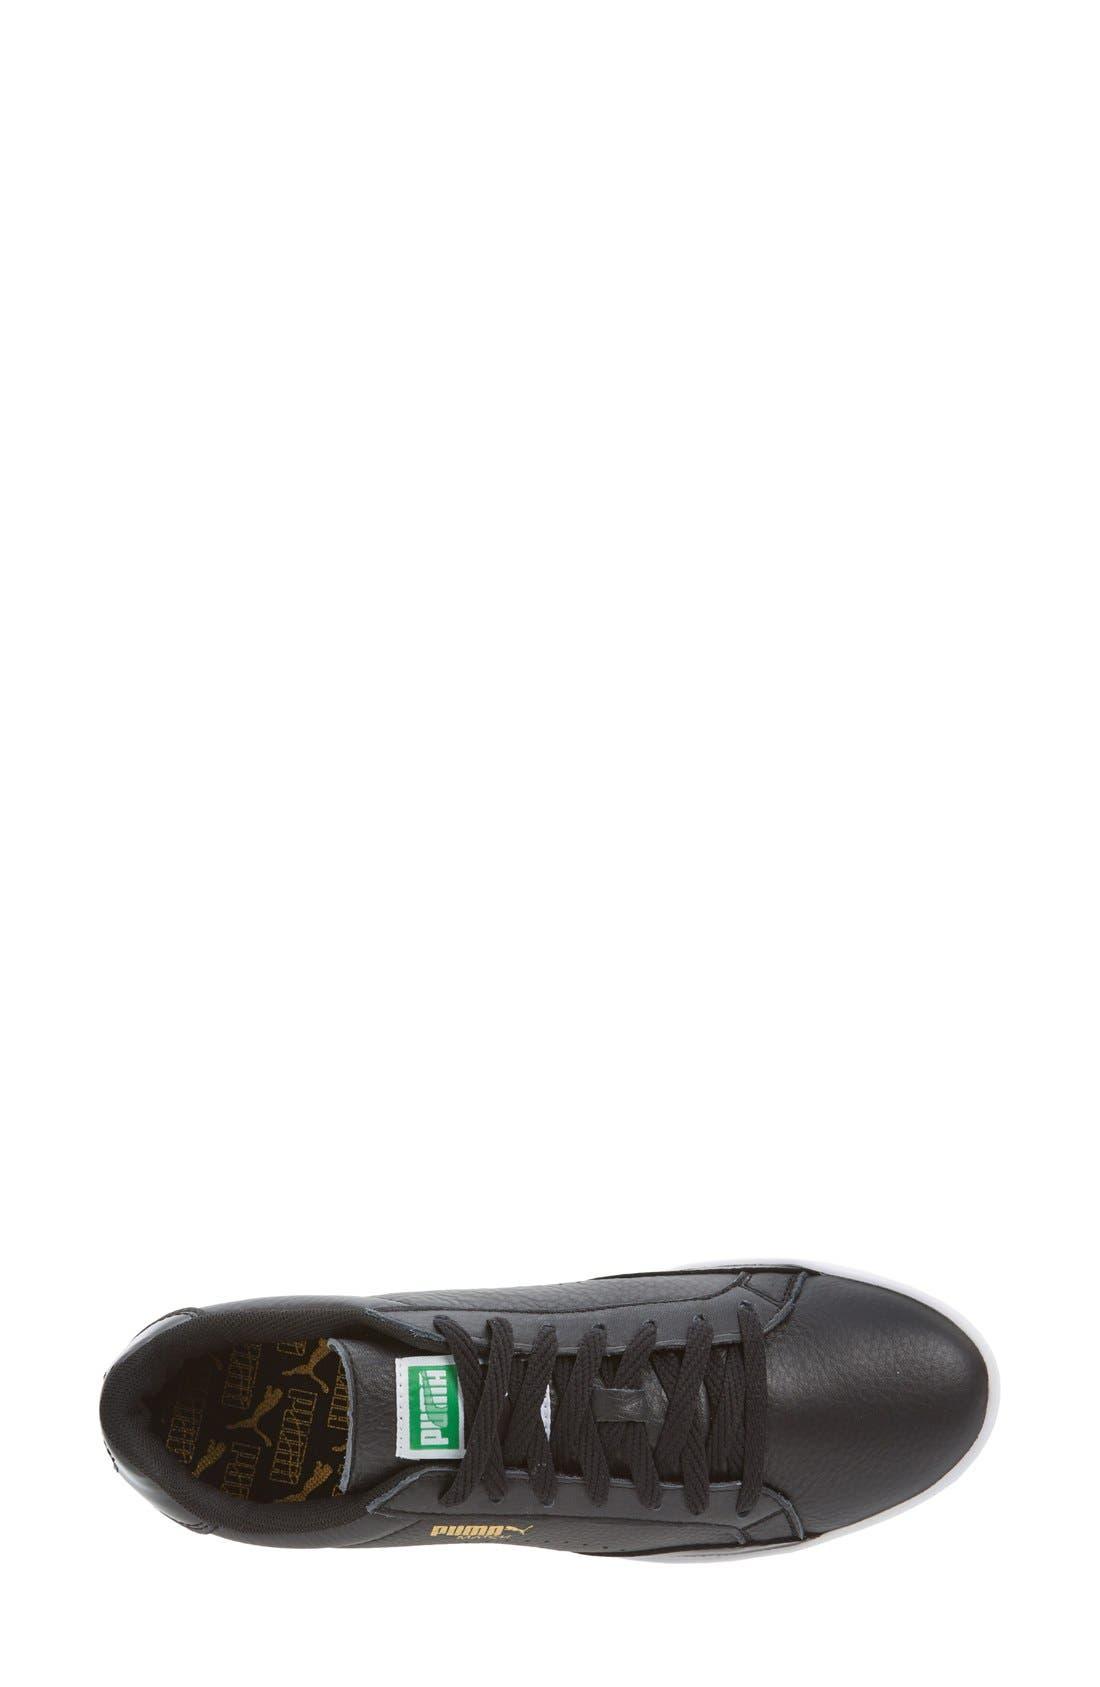 Alternate Image 3  - PUMA 'Match Lo' Sneaker (Women)